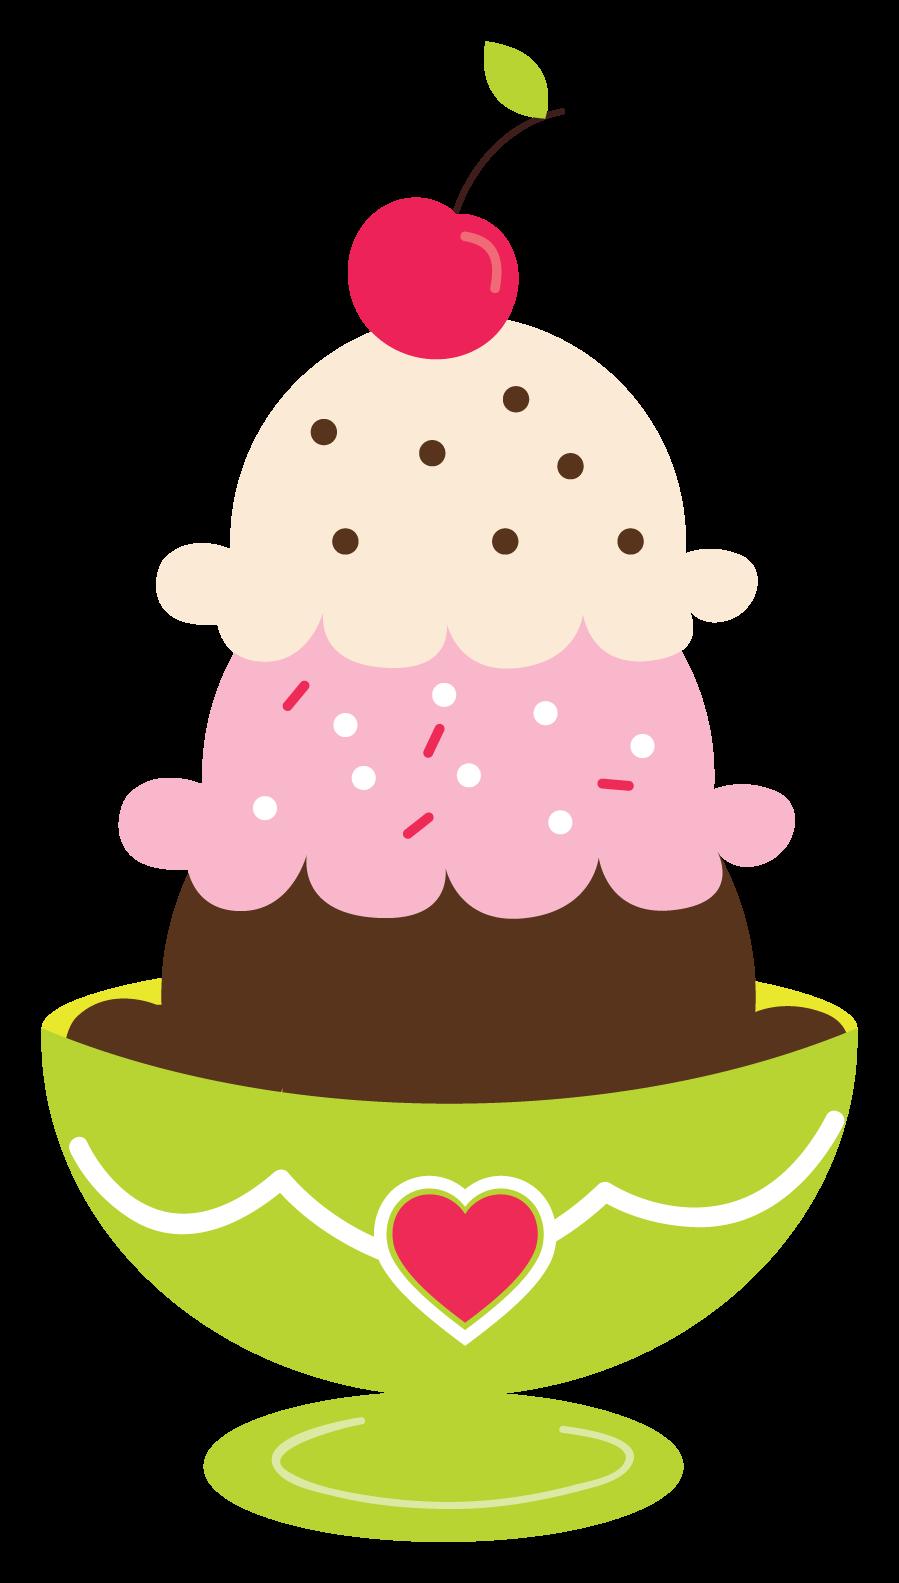 Ice cream sundae clipart kid-Ice cream sundae clipart kid-7